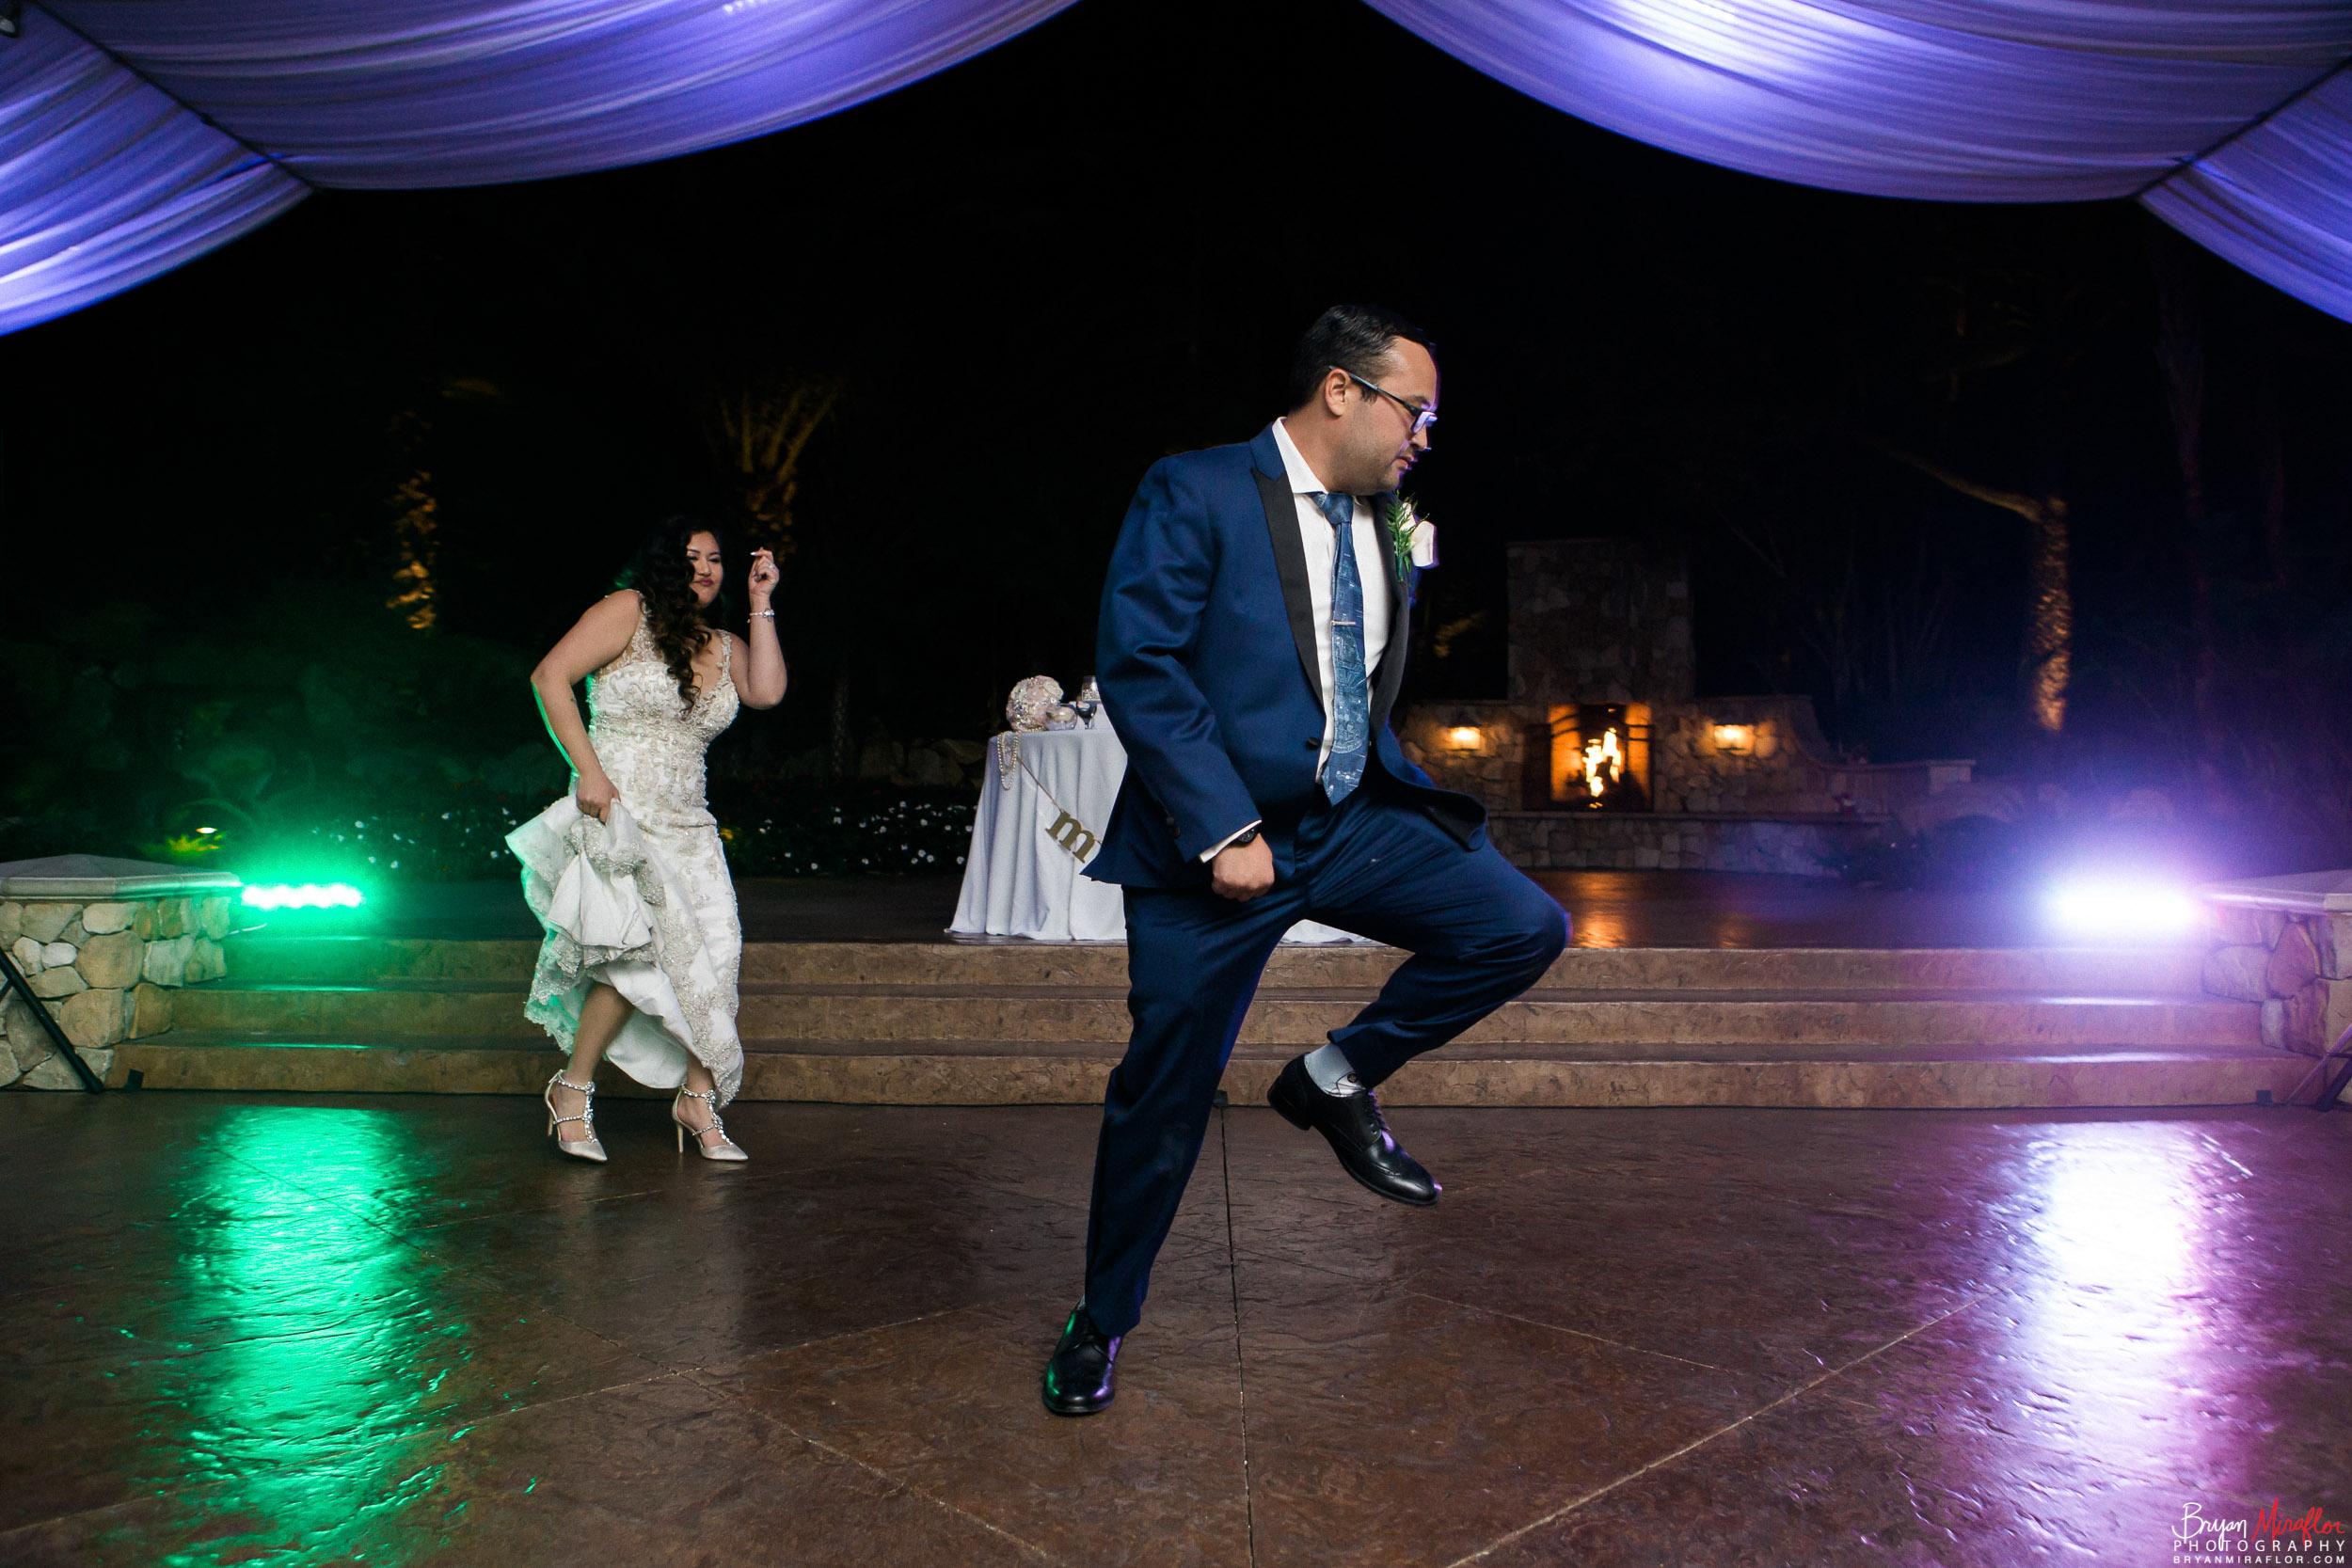 Bryan-Miraflor-Photography-Hannah-Jonathan-Married-Grand-Traditions-Estate-Gardens-Fallbrook-20171222-216.jpg